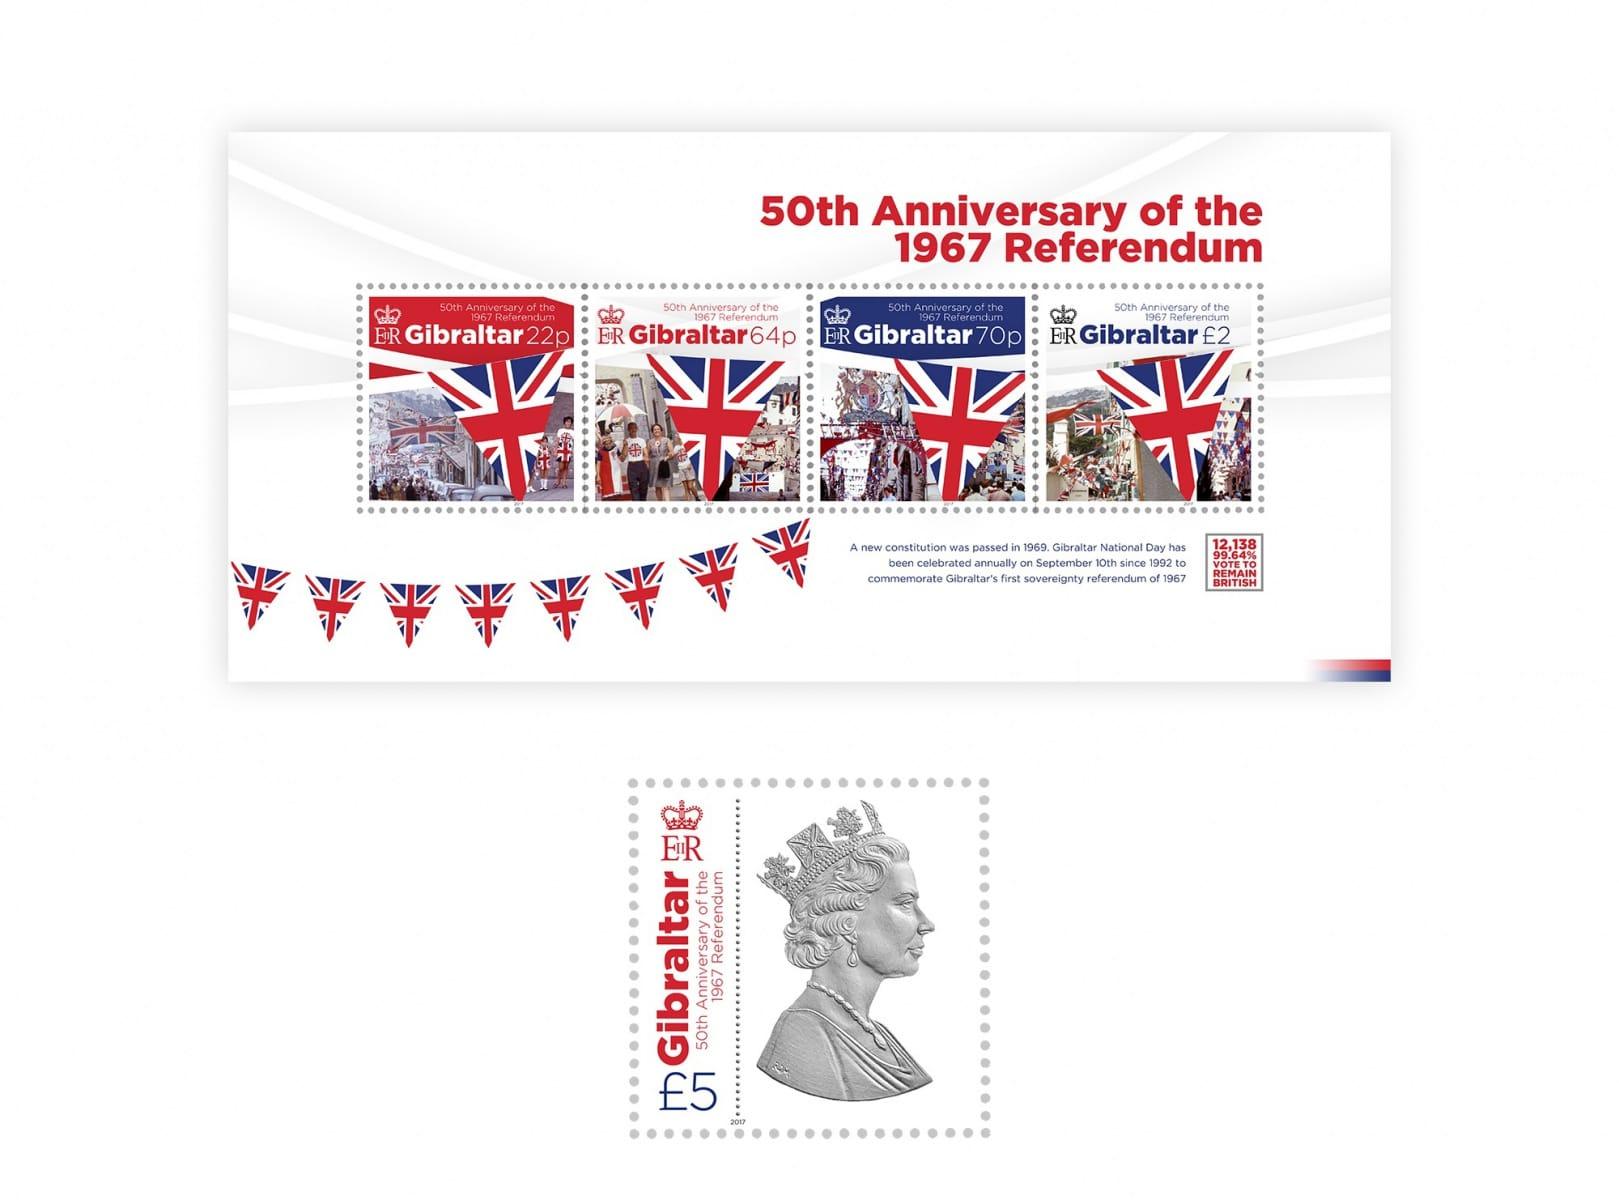 2017-50th-Anniversary-of-the-1967-Referendum